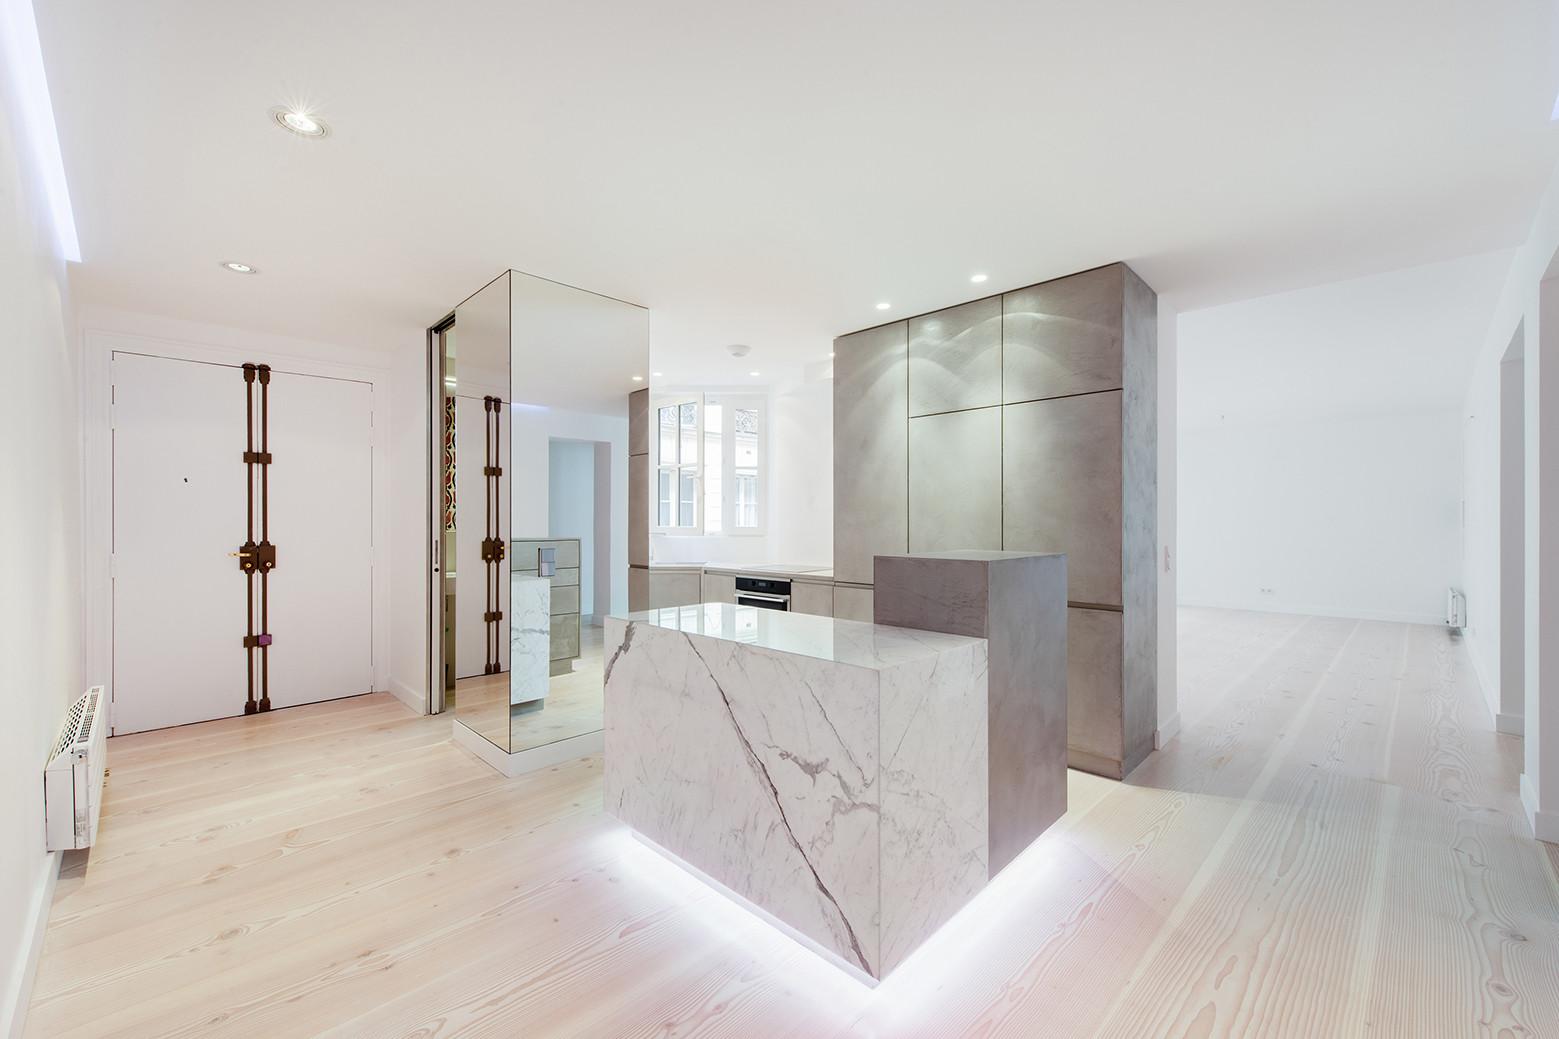 Apartment in Rue de Lille / spamroom, © Martin Argyroglo